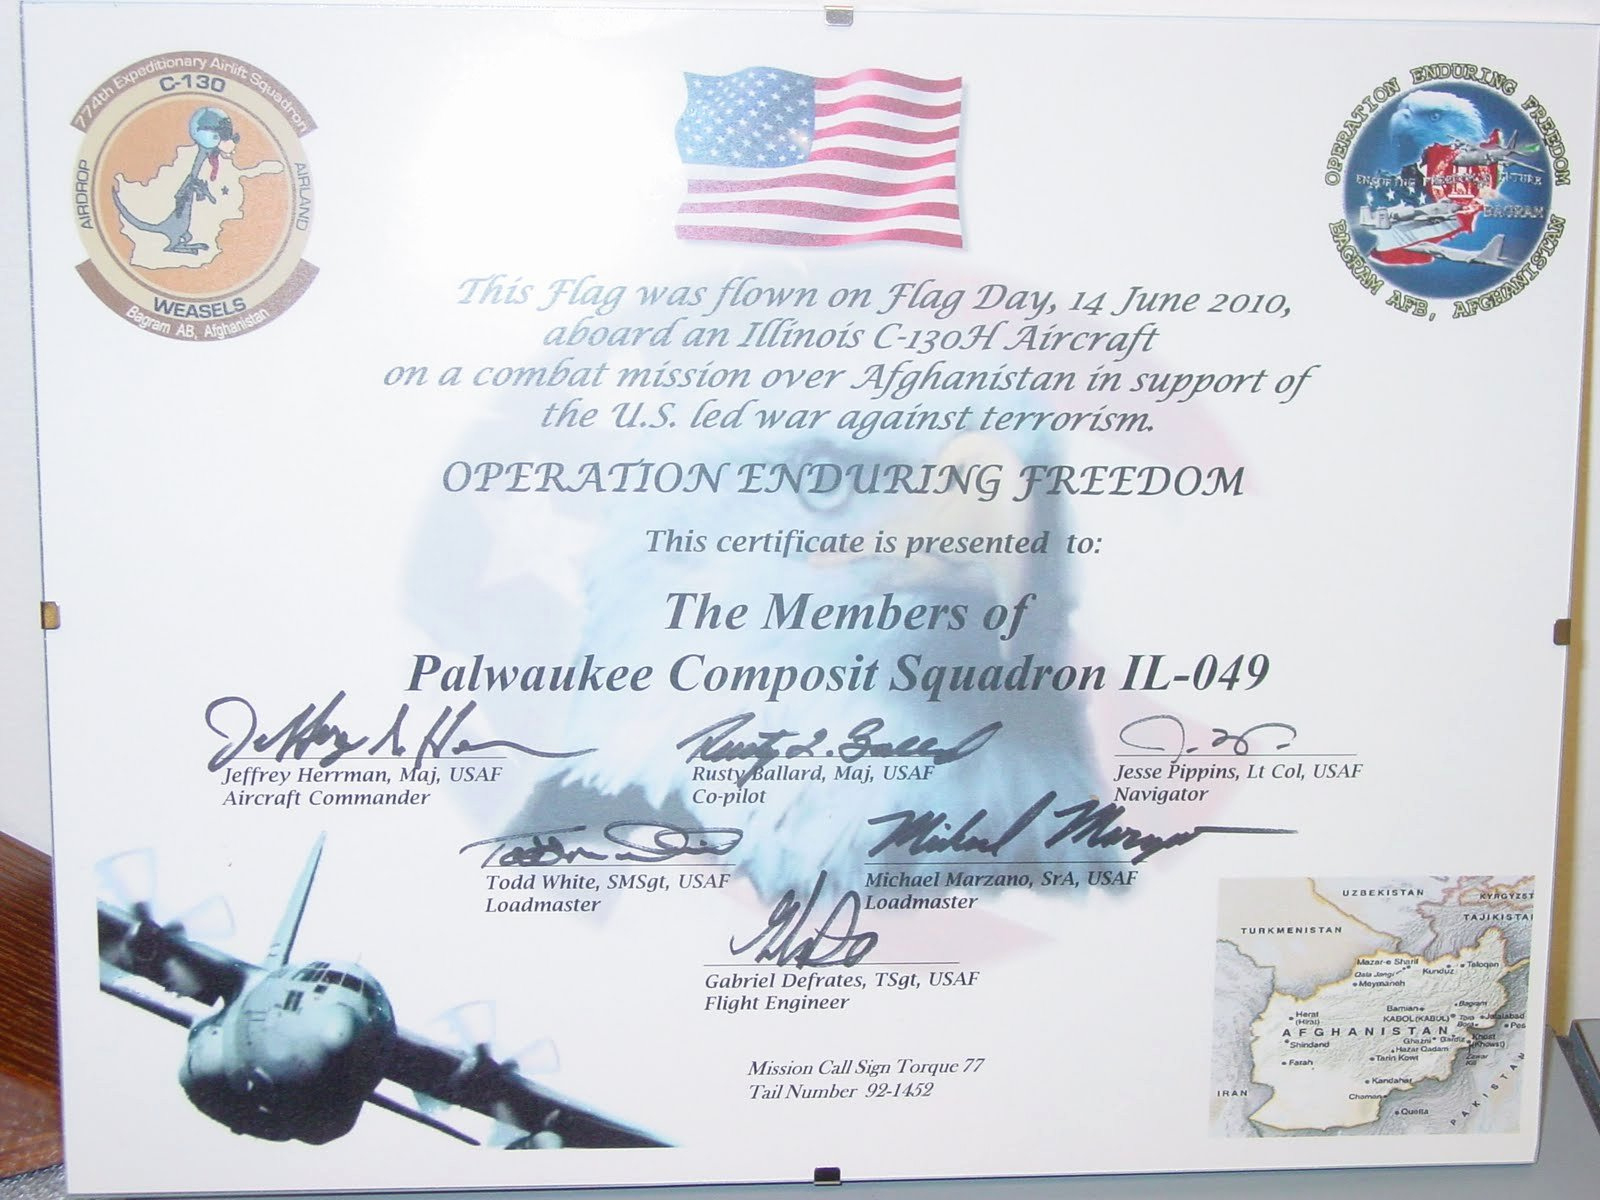 30 Raingutter Regatta Certificate Template  Pryncepality for Printable Promotion Certificate Template